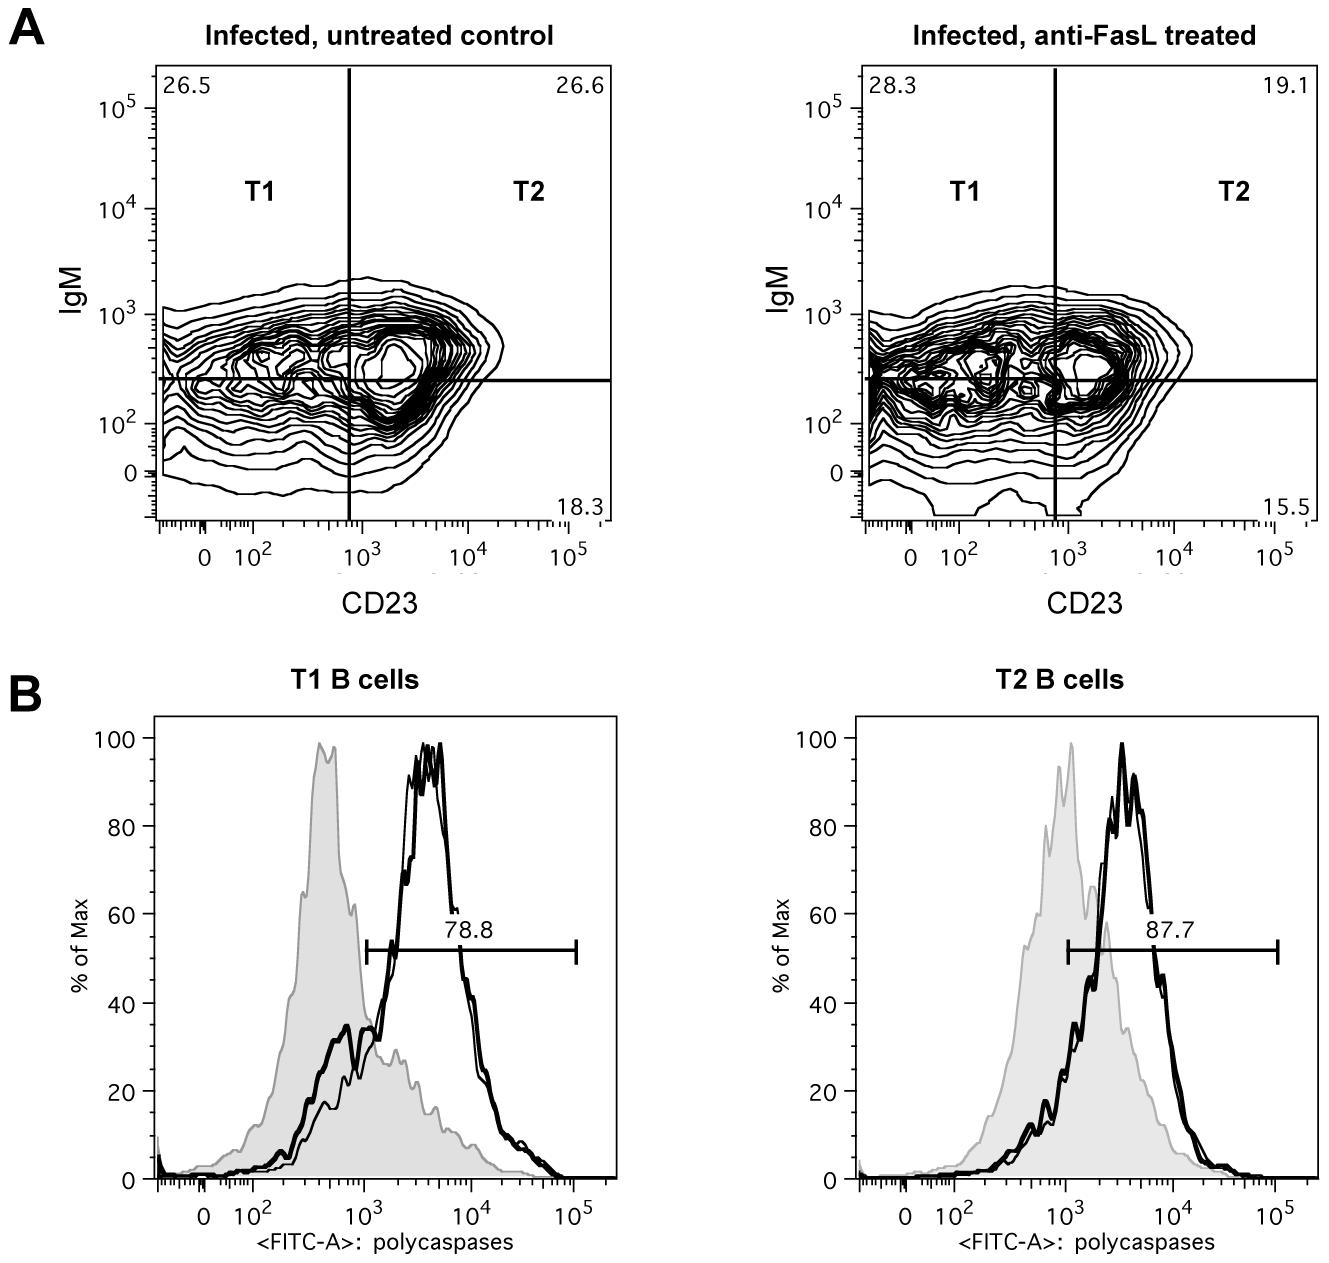 <i>In vivo</i> anti-FasL treatment of <i>T. brucei</i> infected mice.